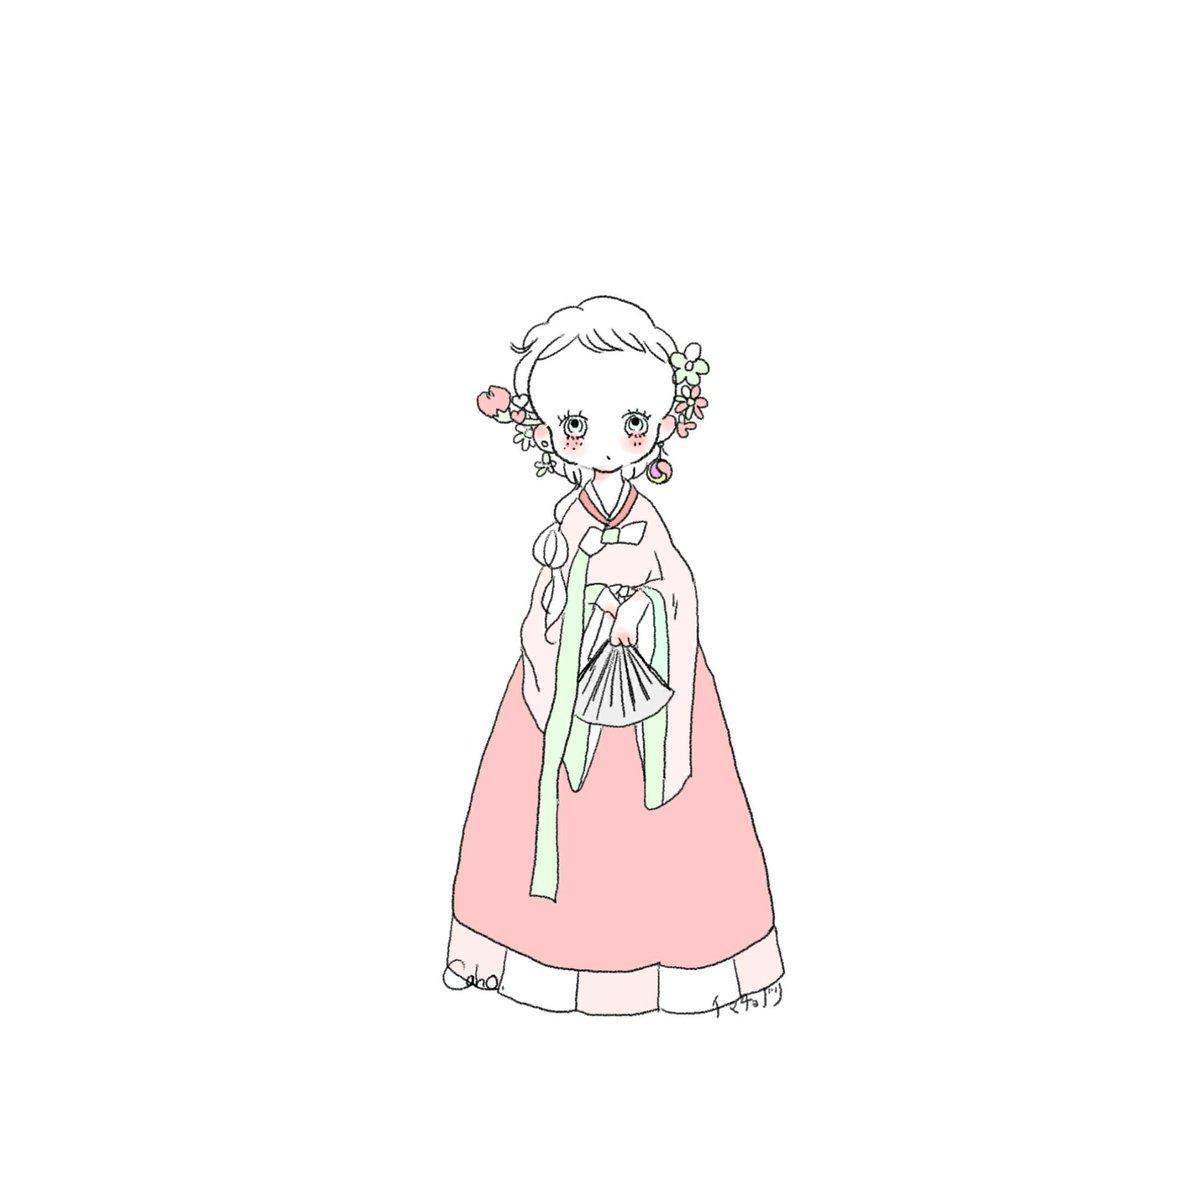 Caho On Twitter 世界の衣装が可愛すぎて描きました 韓国